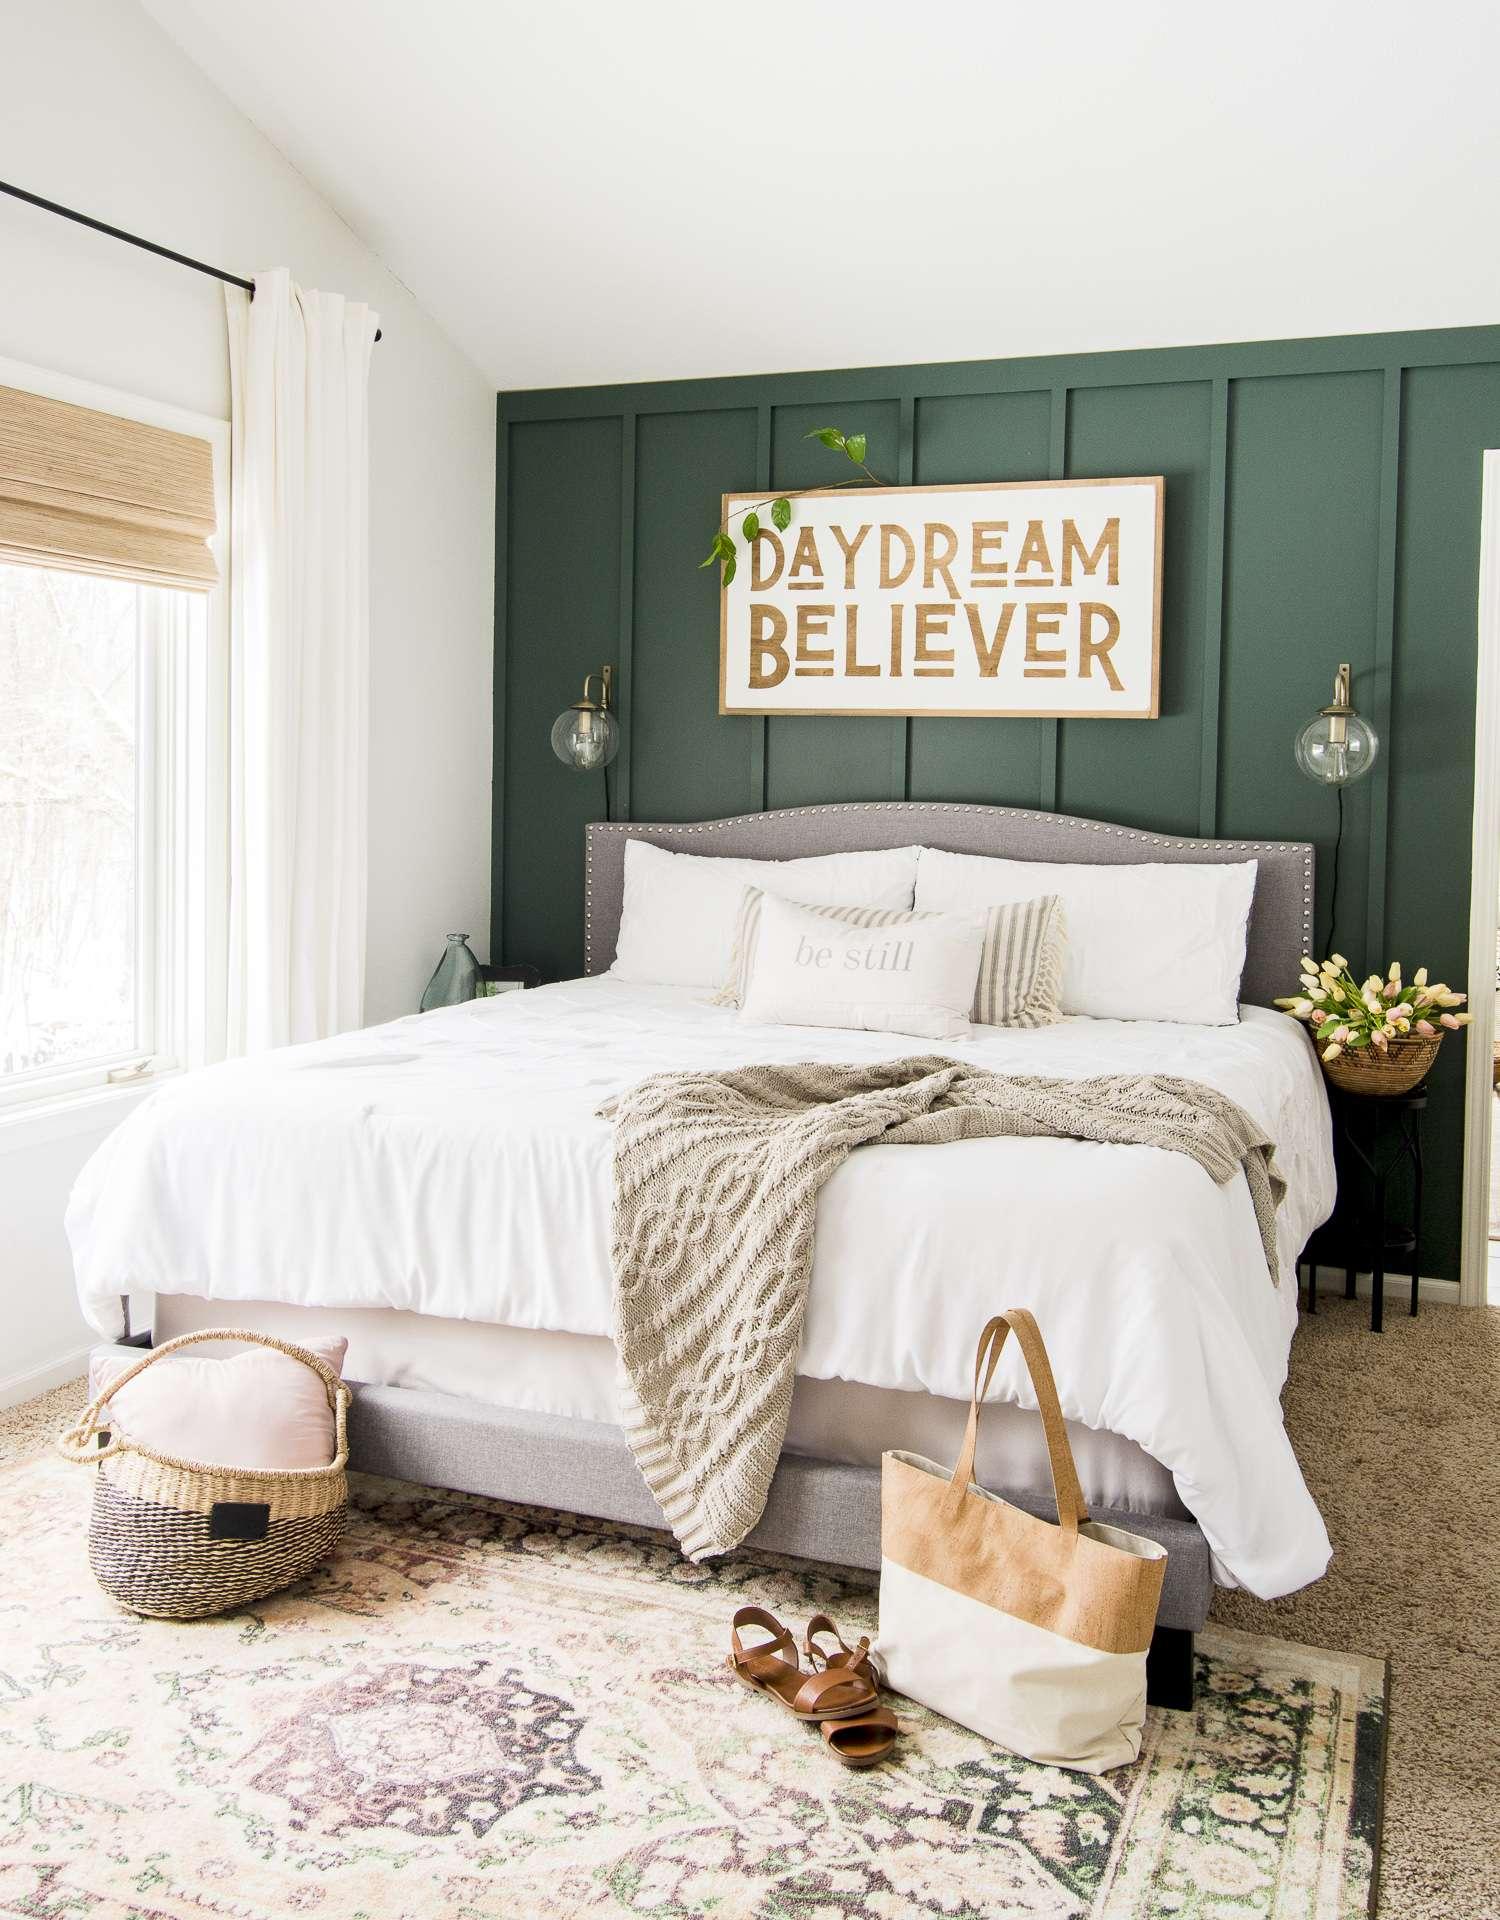 Daydream believer farmhouse sign decor.